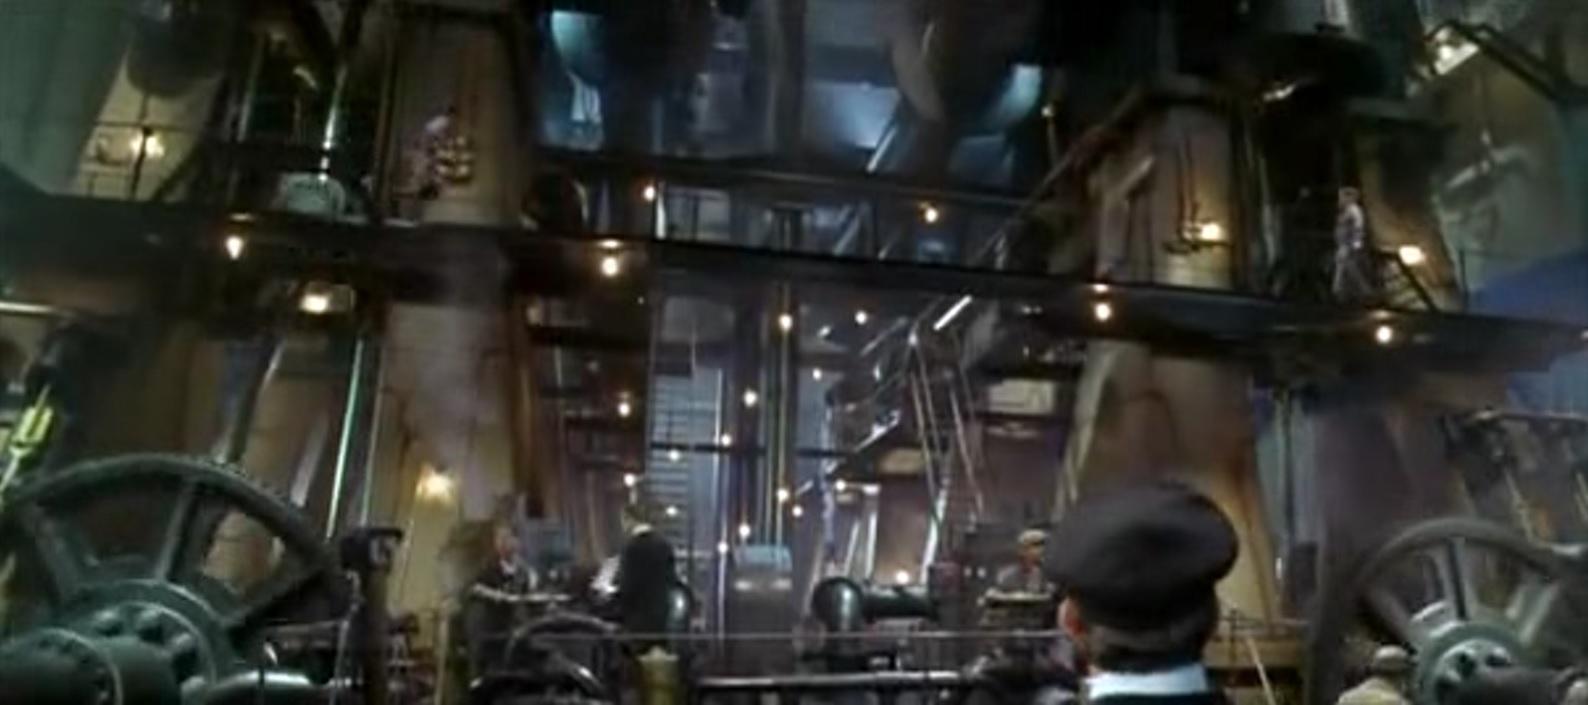 Reciprocating Engine Room